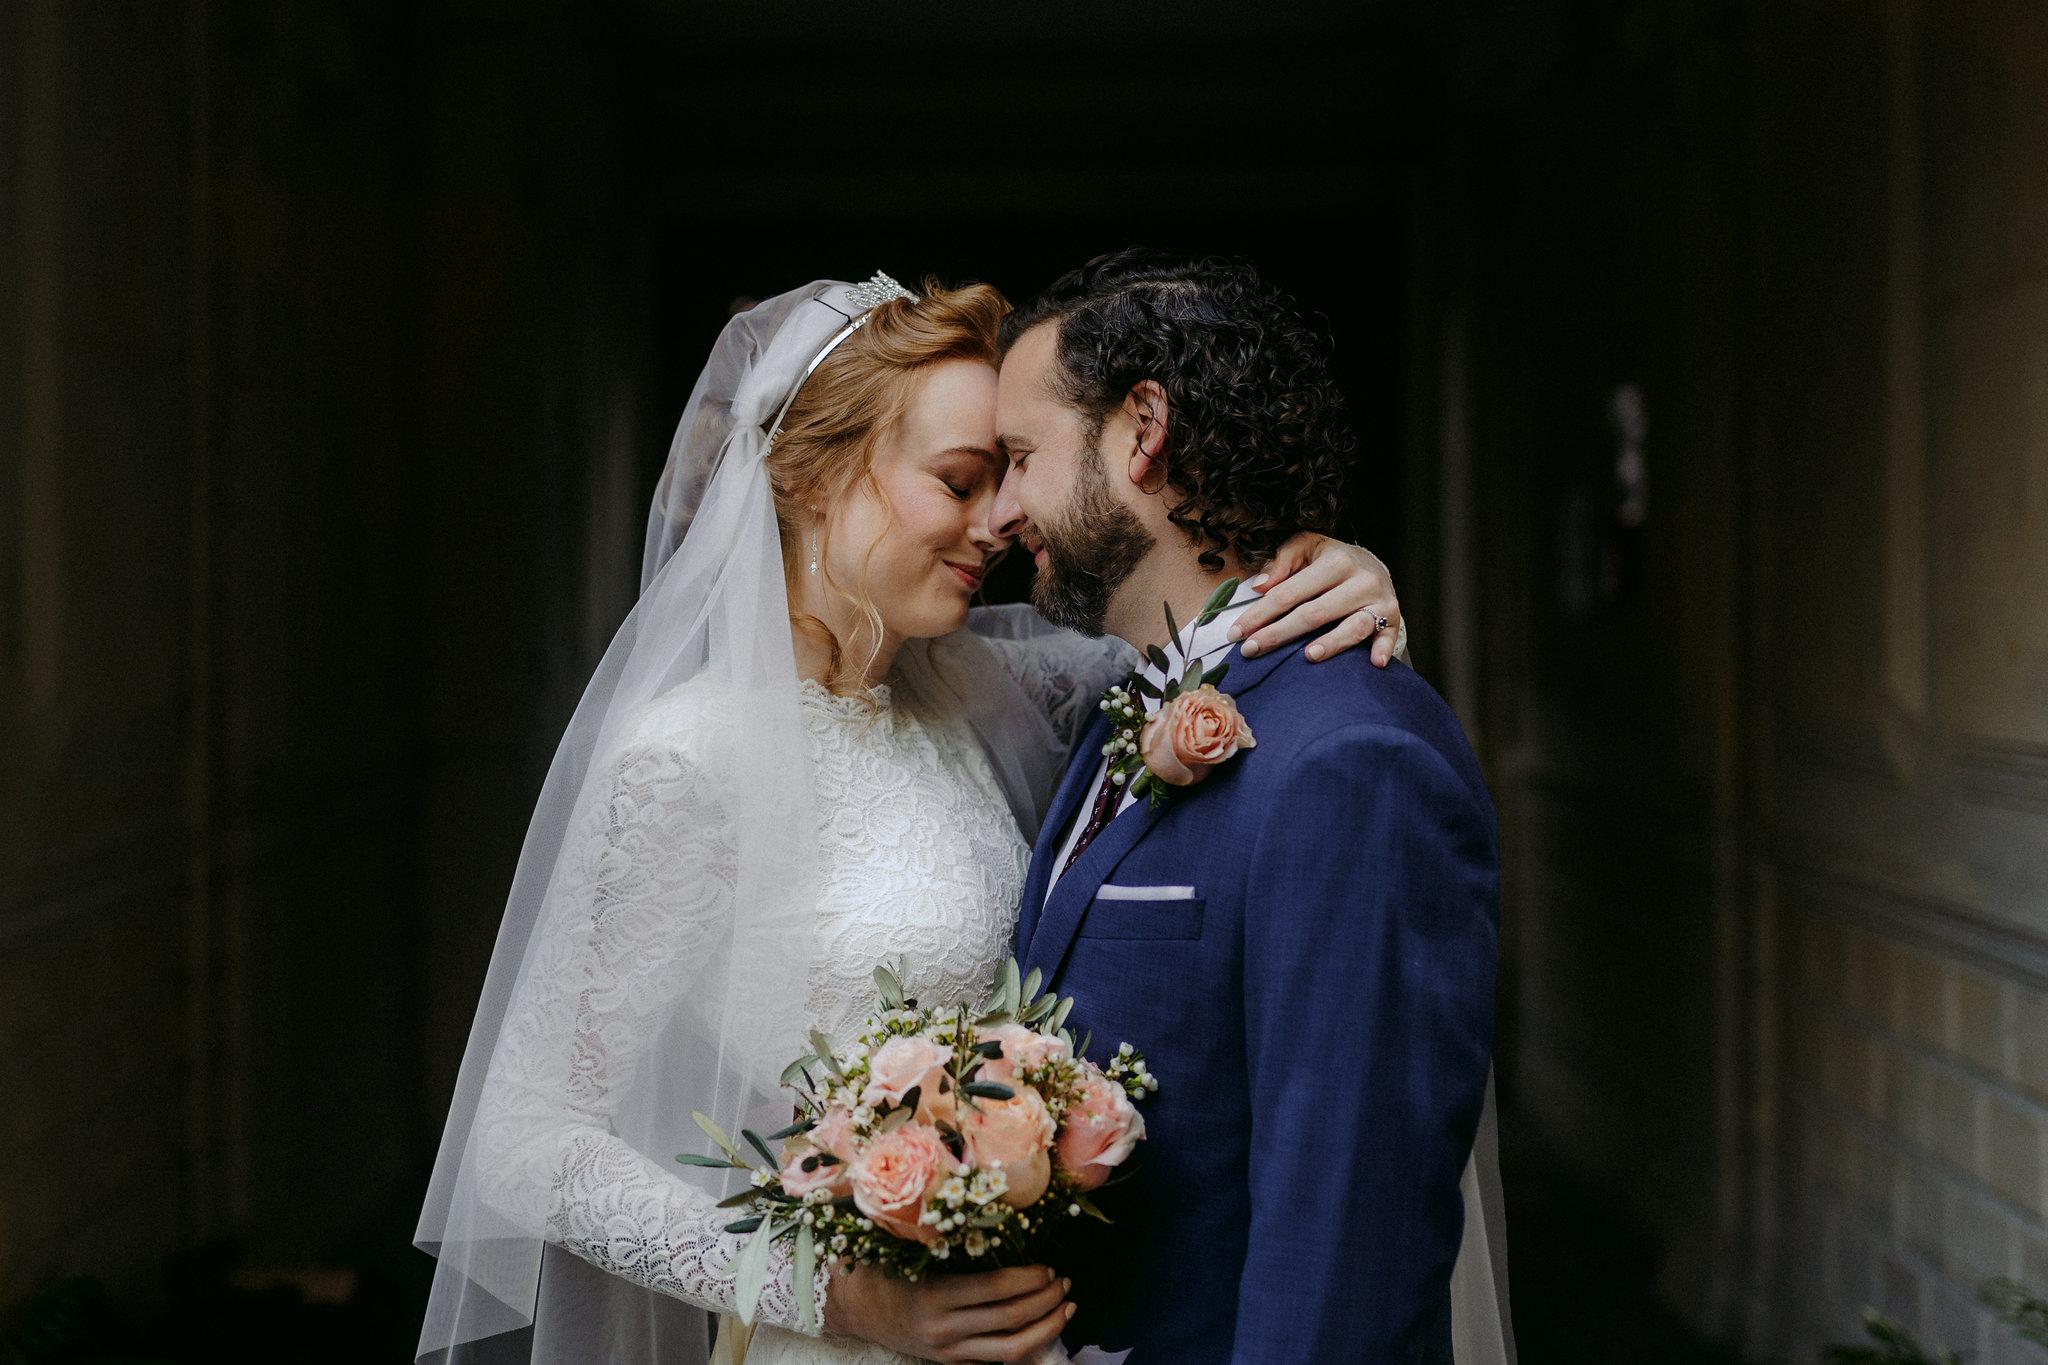 Paris_elopement_wedding_photographer-69.jpg